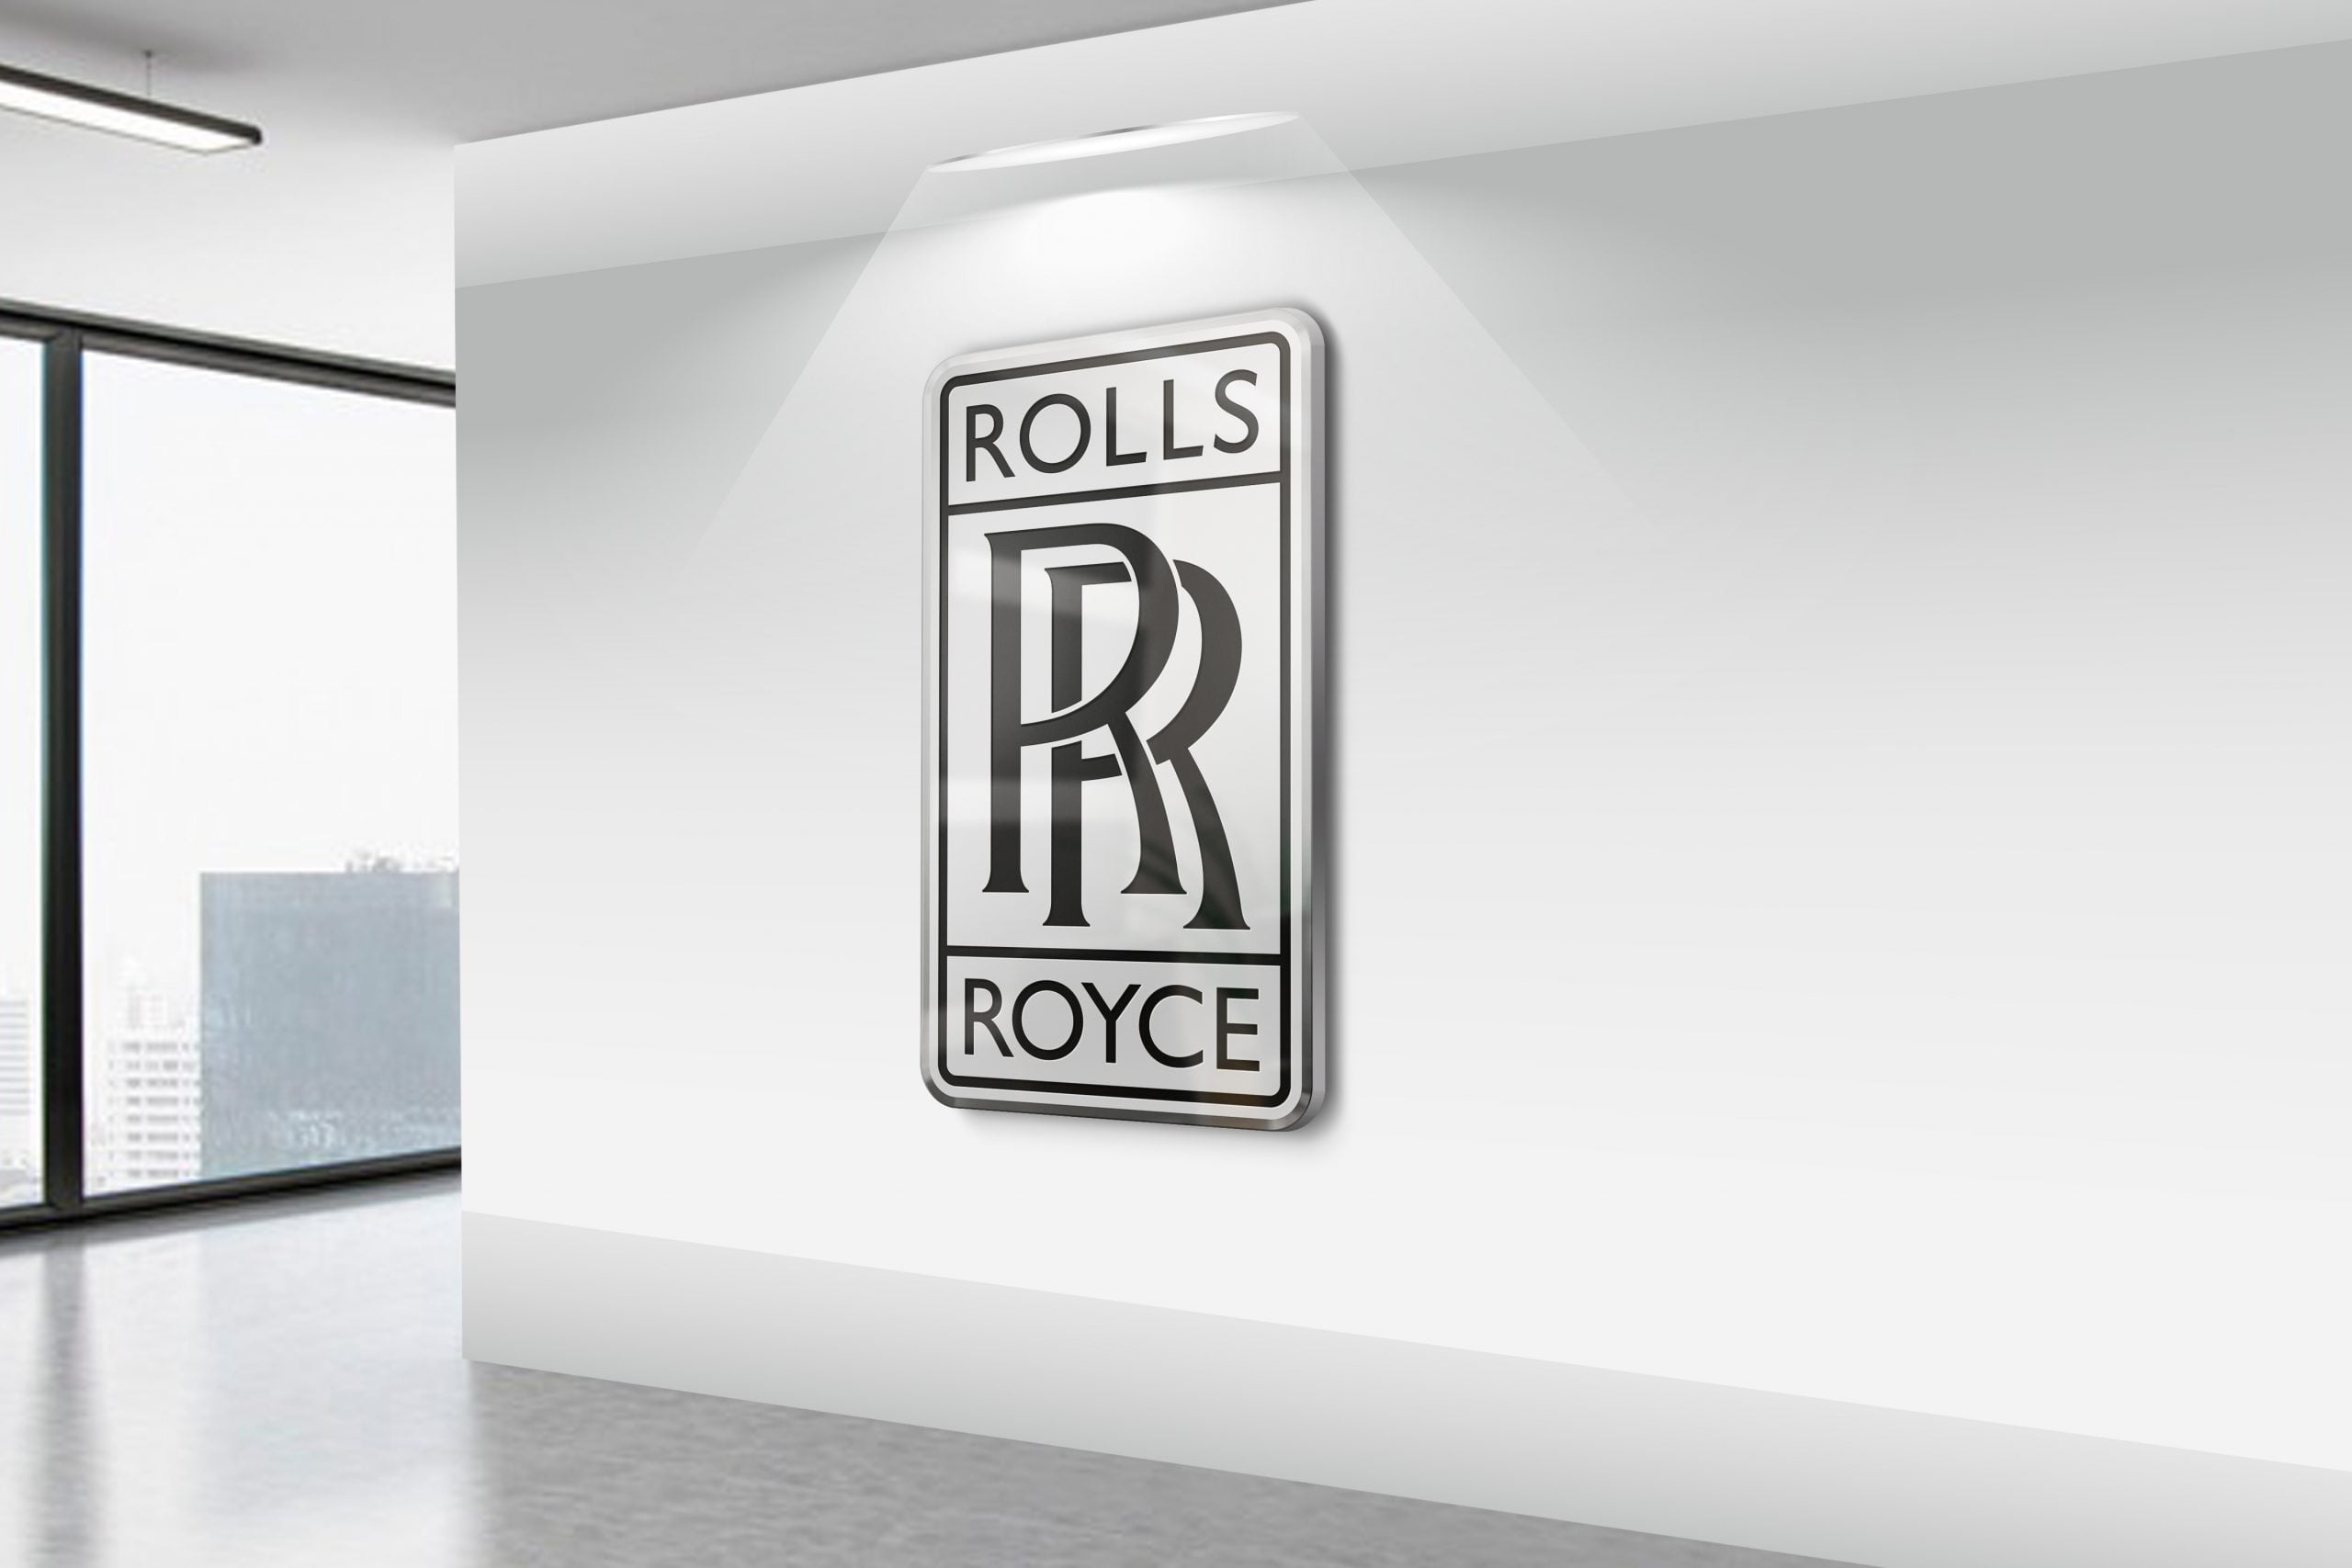 Rolls-Royce-Realistic-3D-Wall-Logo-MockUp